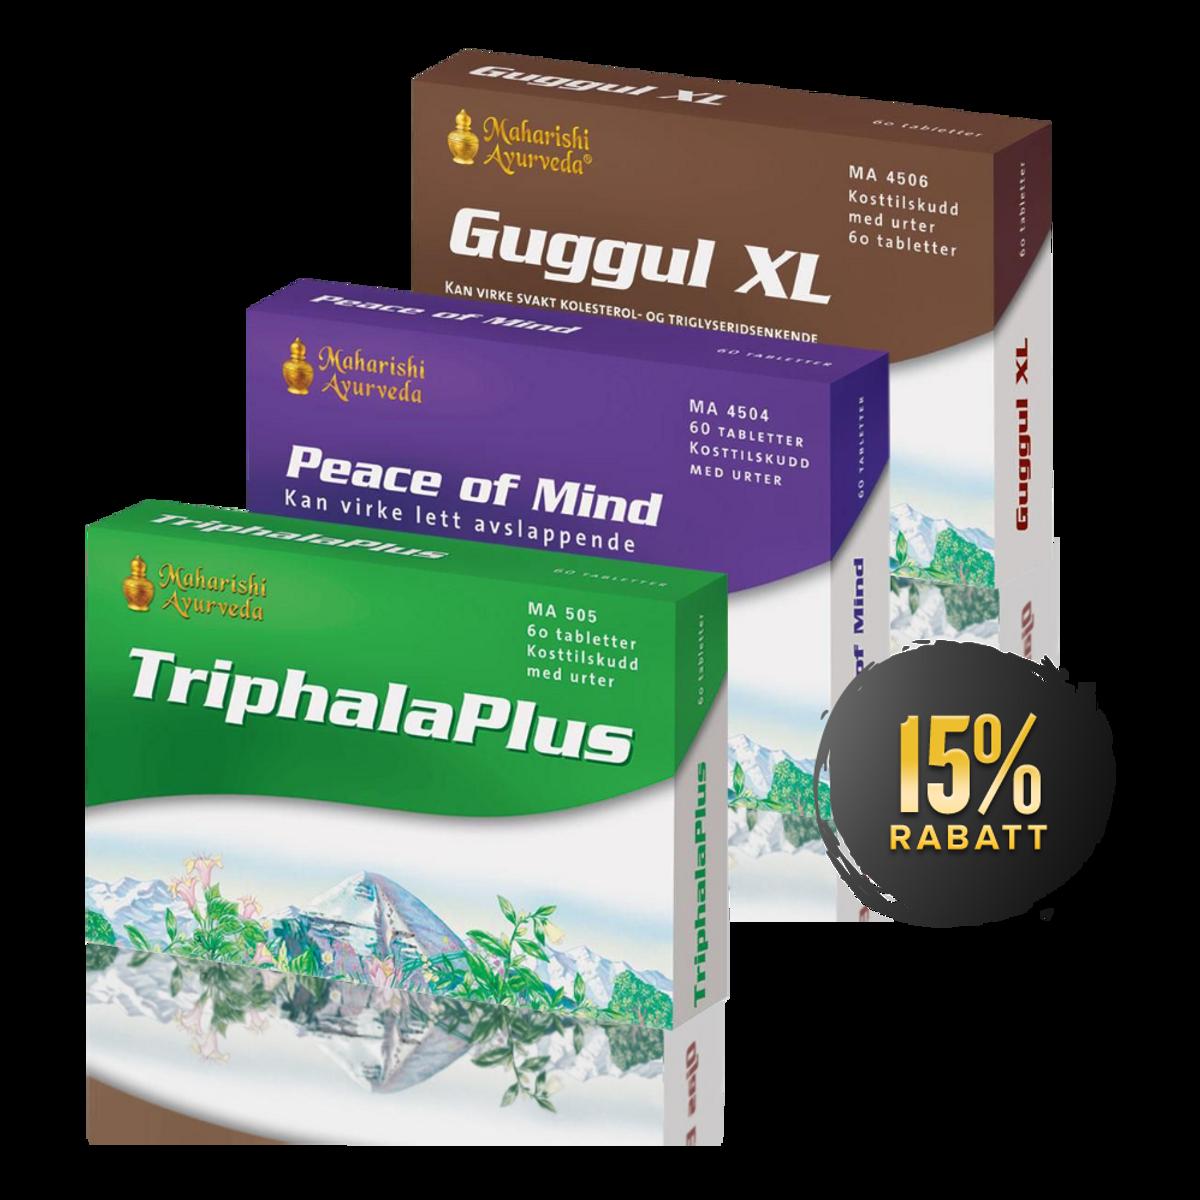 Ned i vekt pakken (Triphala Plus + Guggul XL + Peace of Mind)